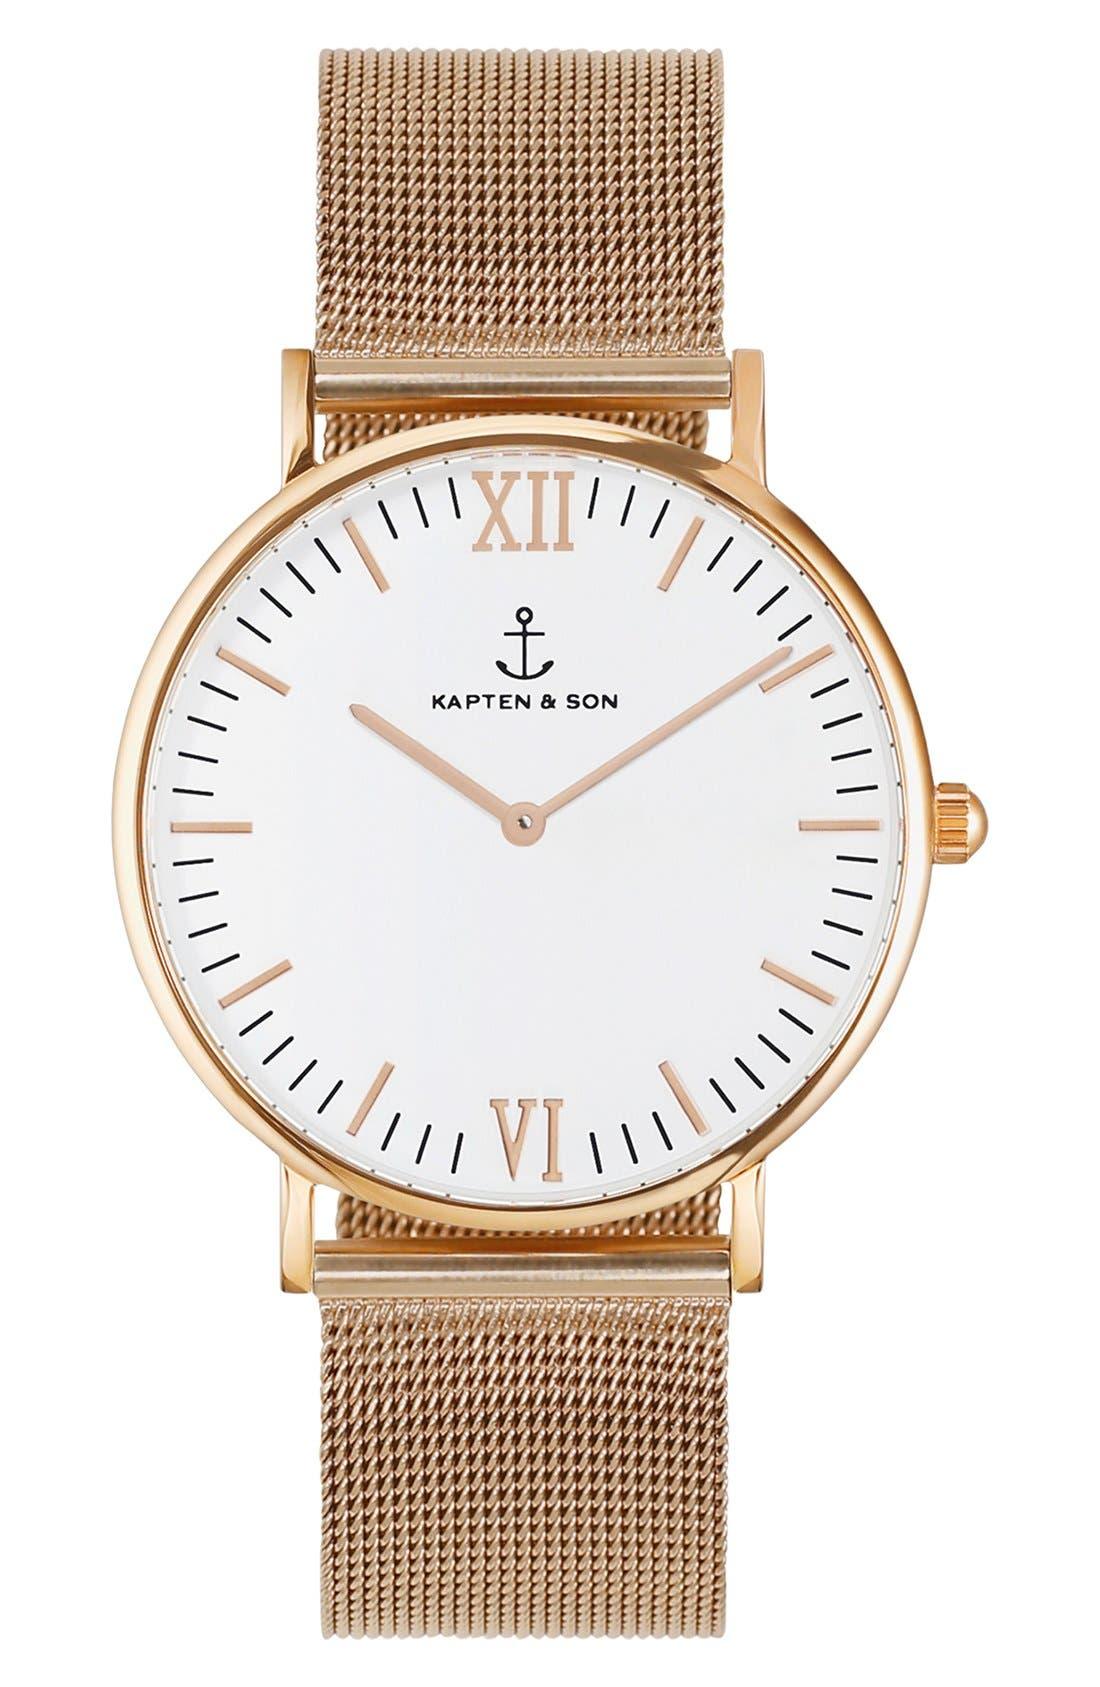 Kapten & Son Campina Mesh Strap Watch, 36mm